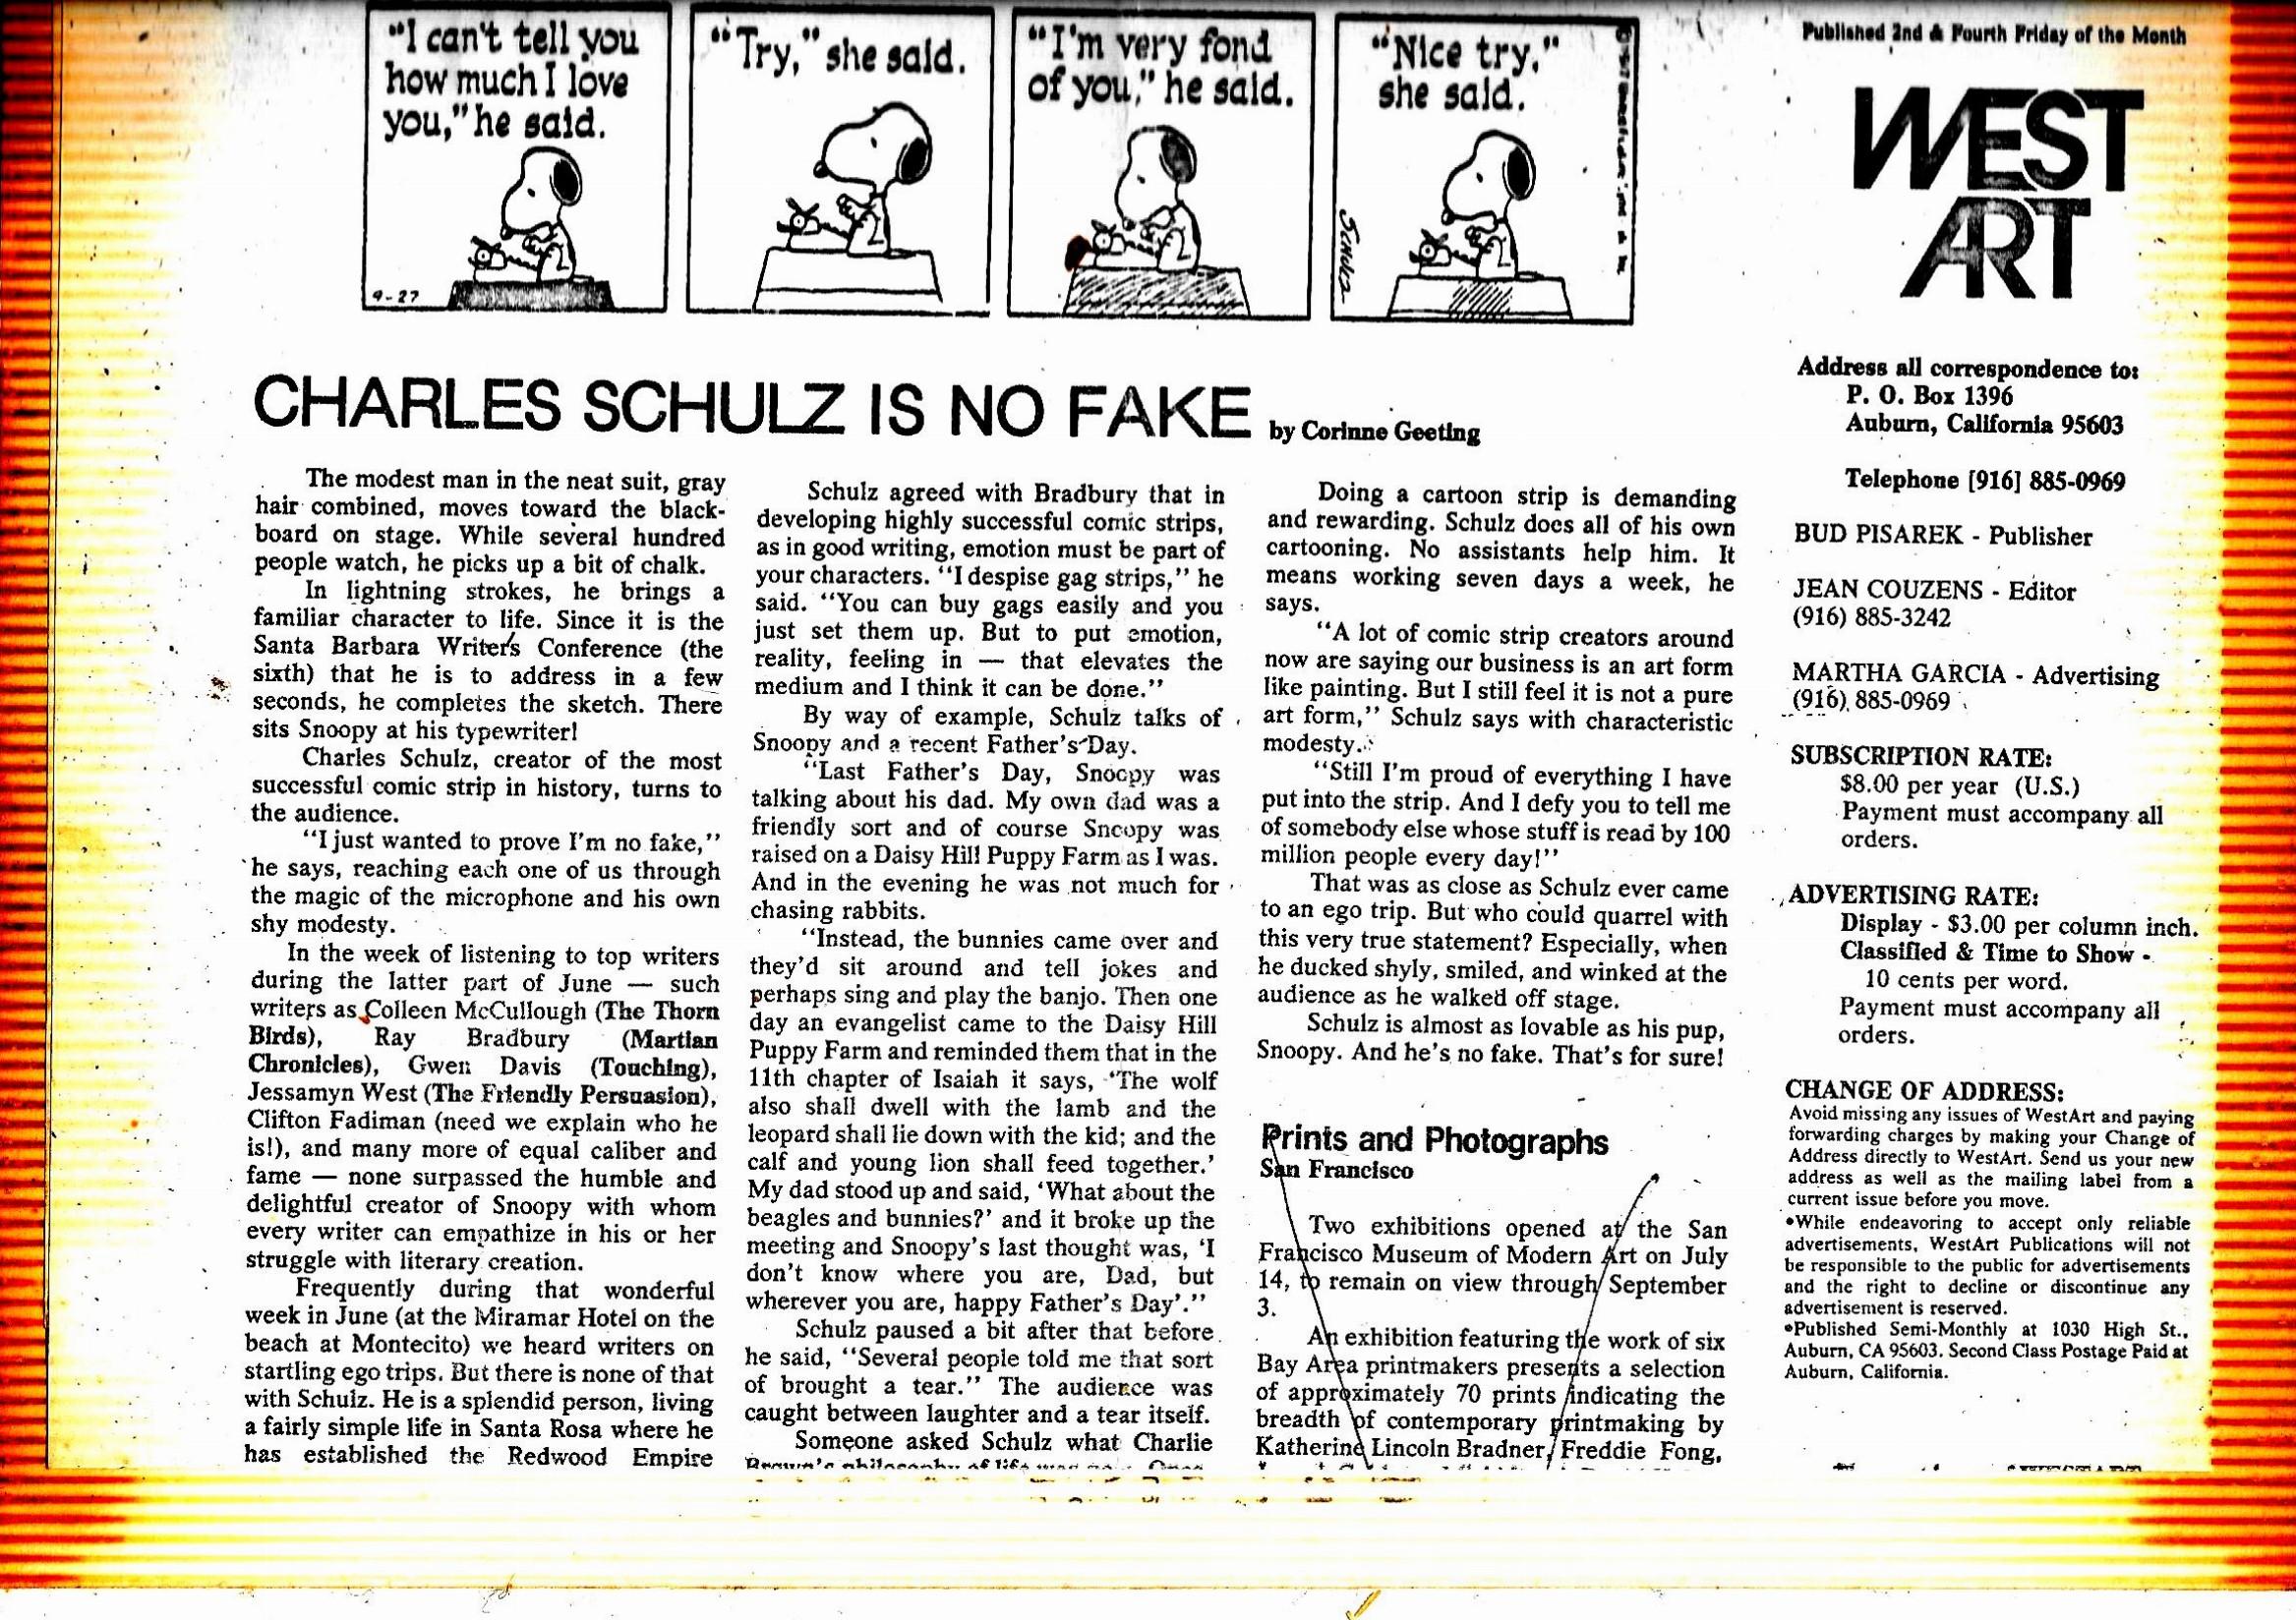 1978 Charles Schulz